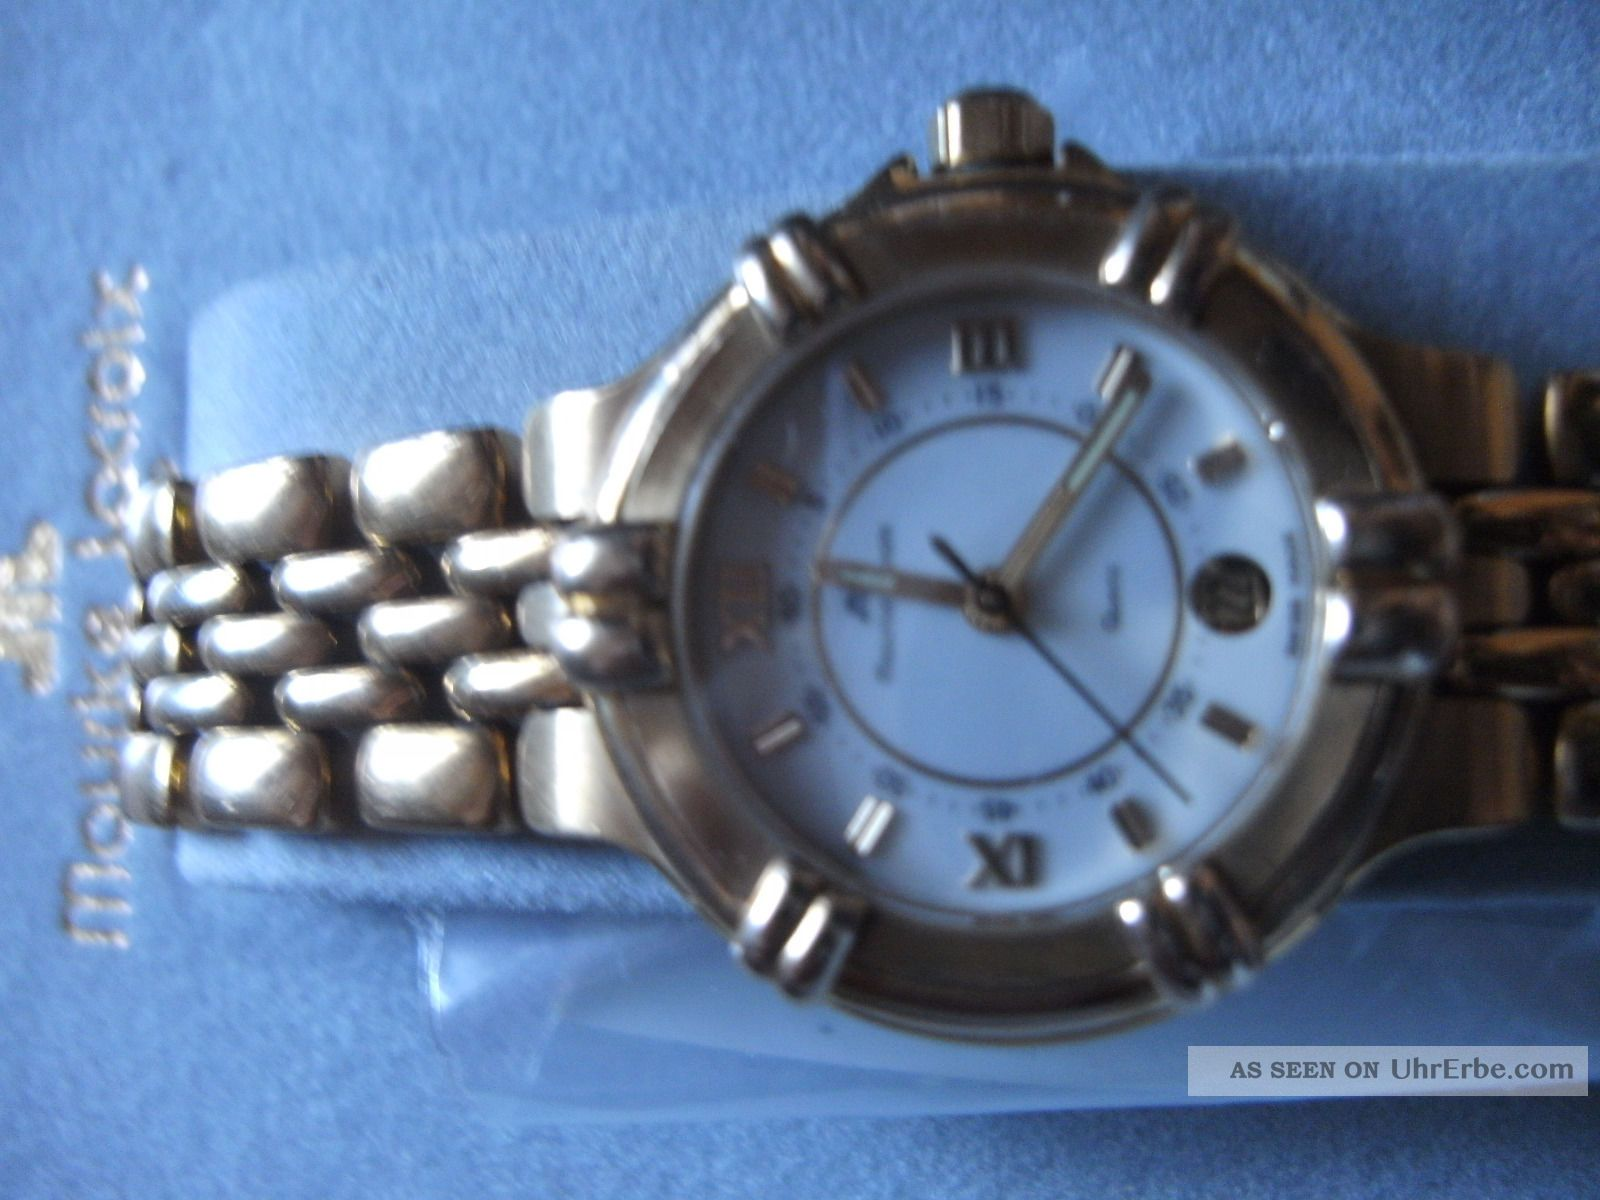 Maurice Lacroix Damen Golduhr (10k Elekroplatiert) Neue Batterie Armbanduhren Bild